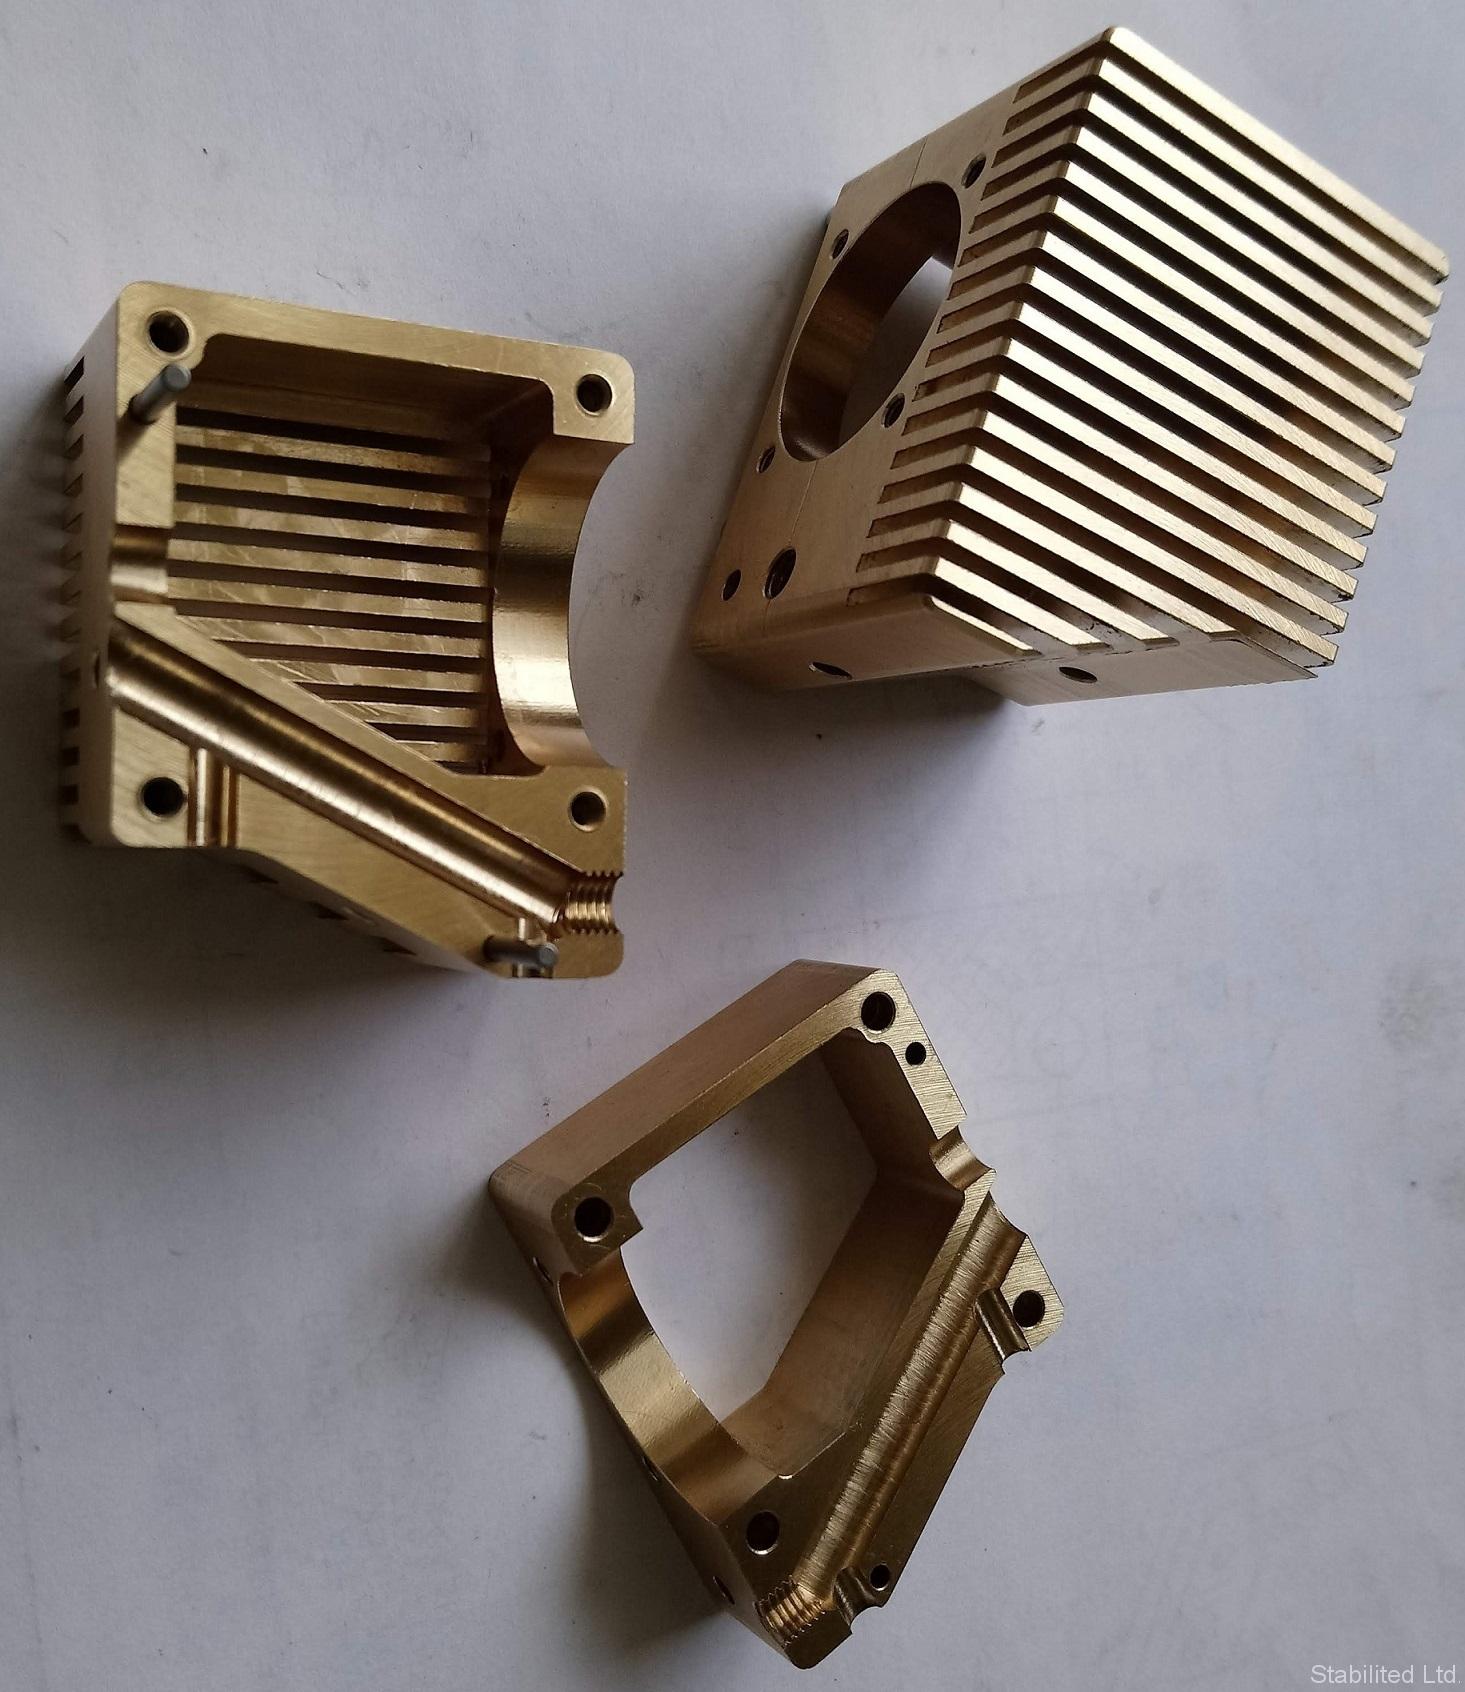 [:bg]Изпълнена поръчка за Термохран инженеринг АД[:en]Thermohran Engineering parts[:]